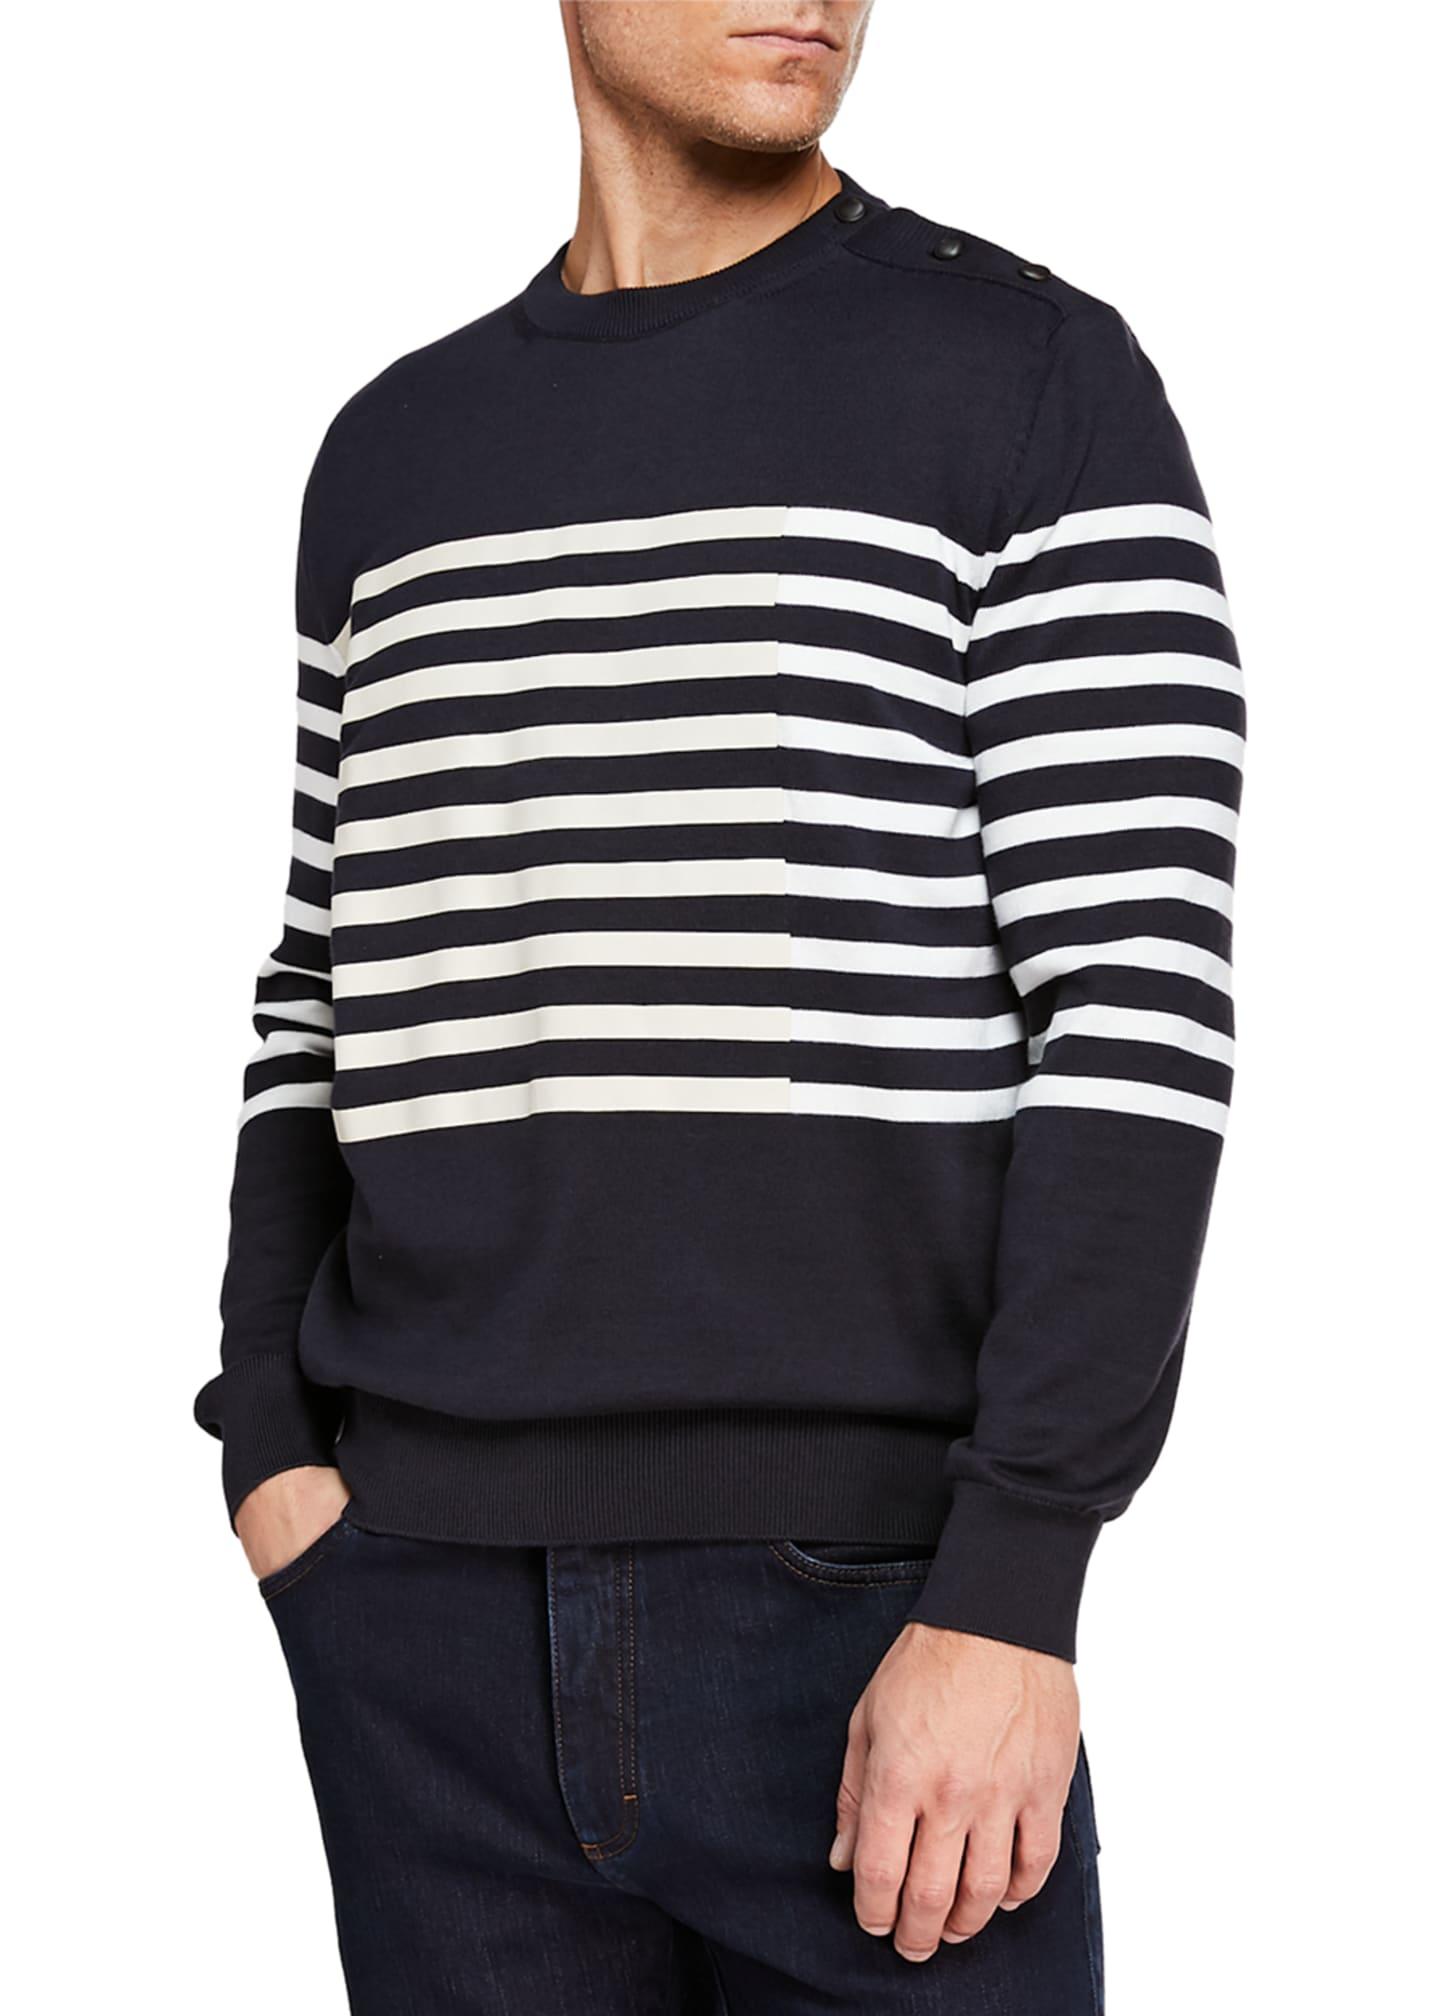 Ermenegildo Zegna Men's Striped Crewneck Sweatshirt with Buttons